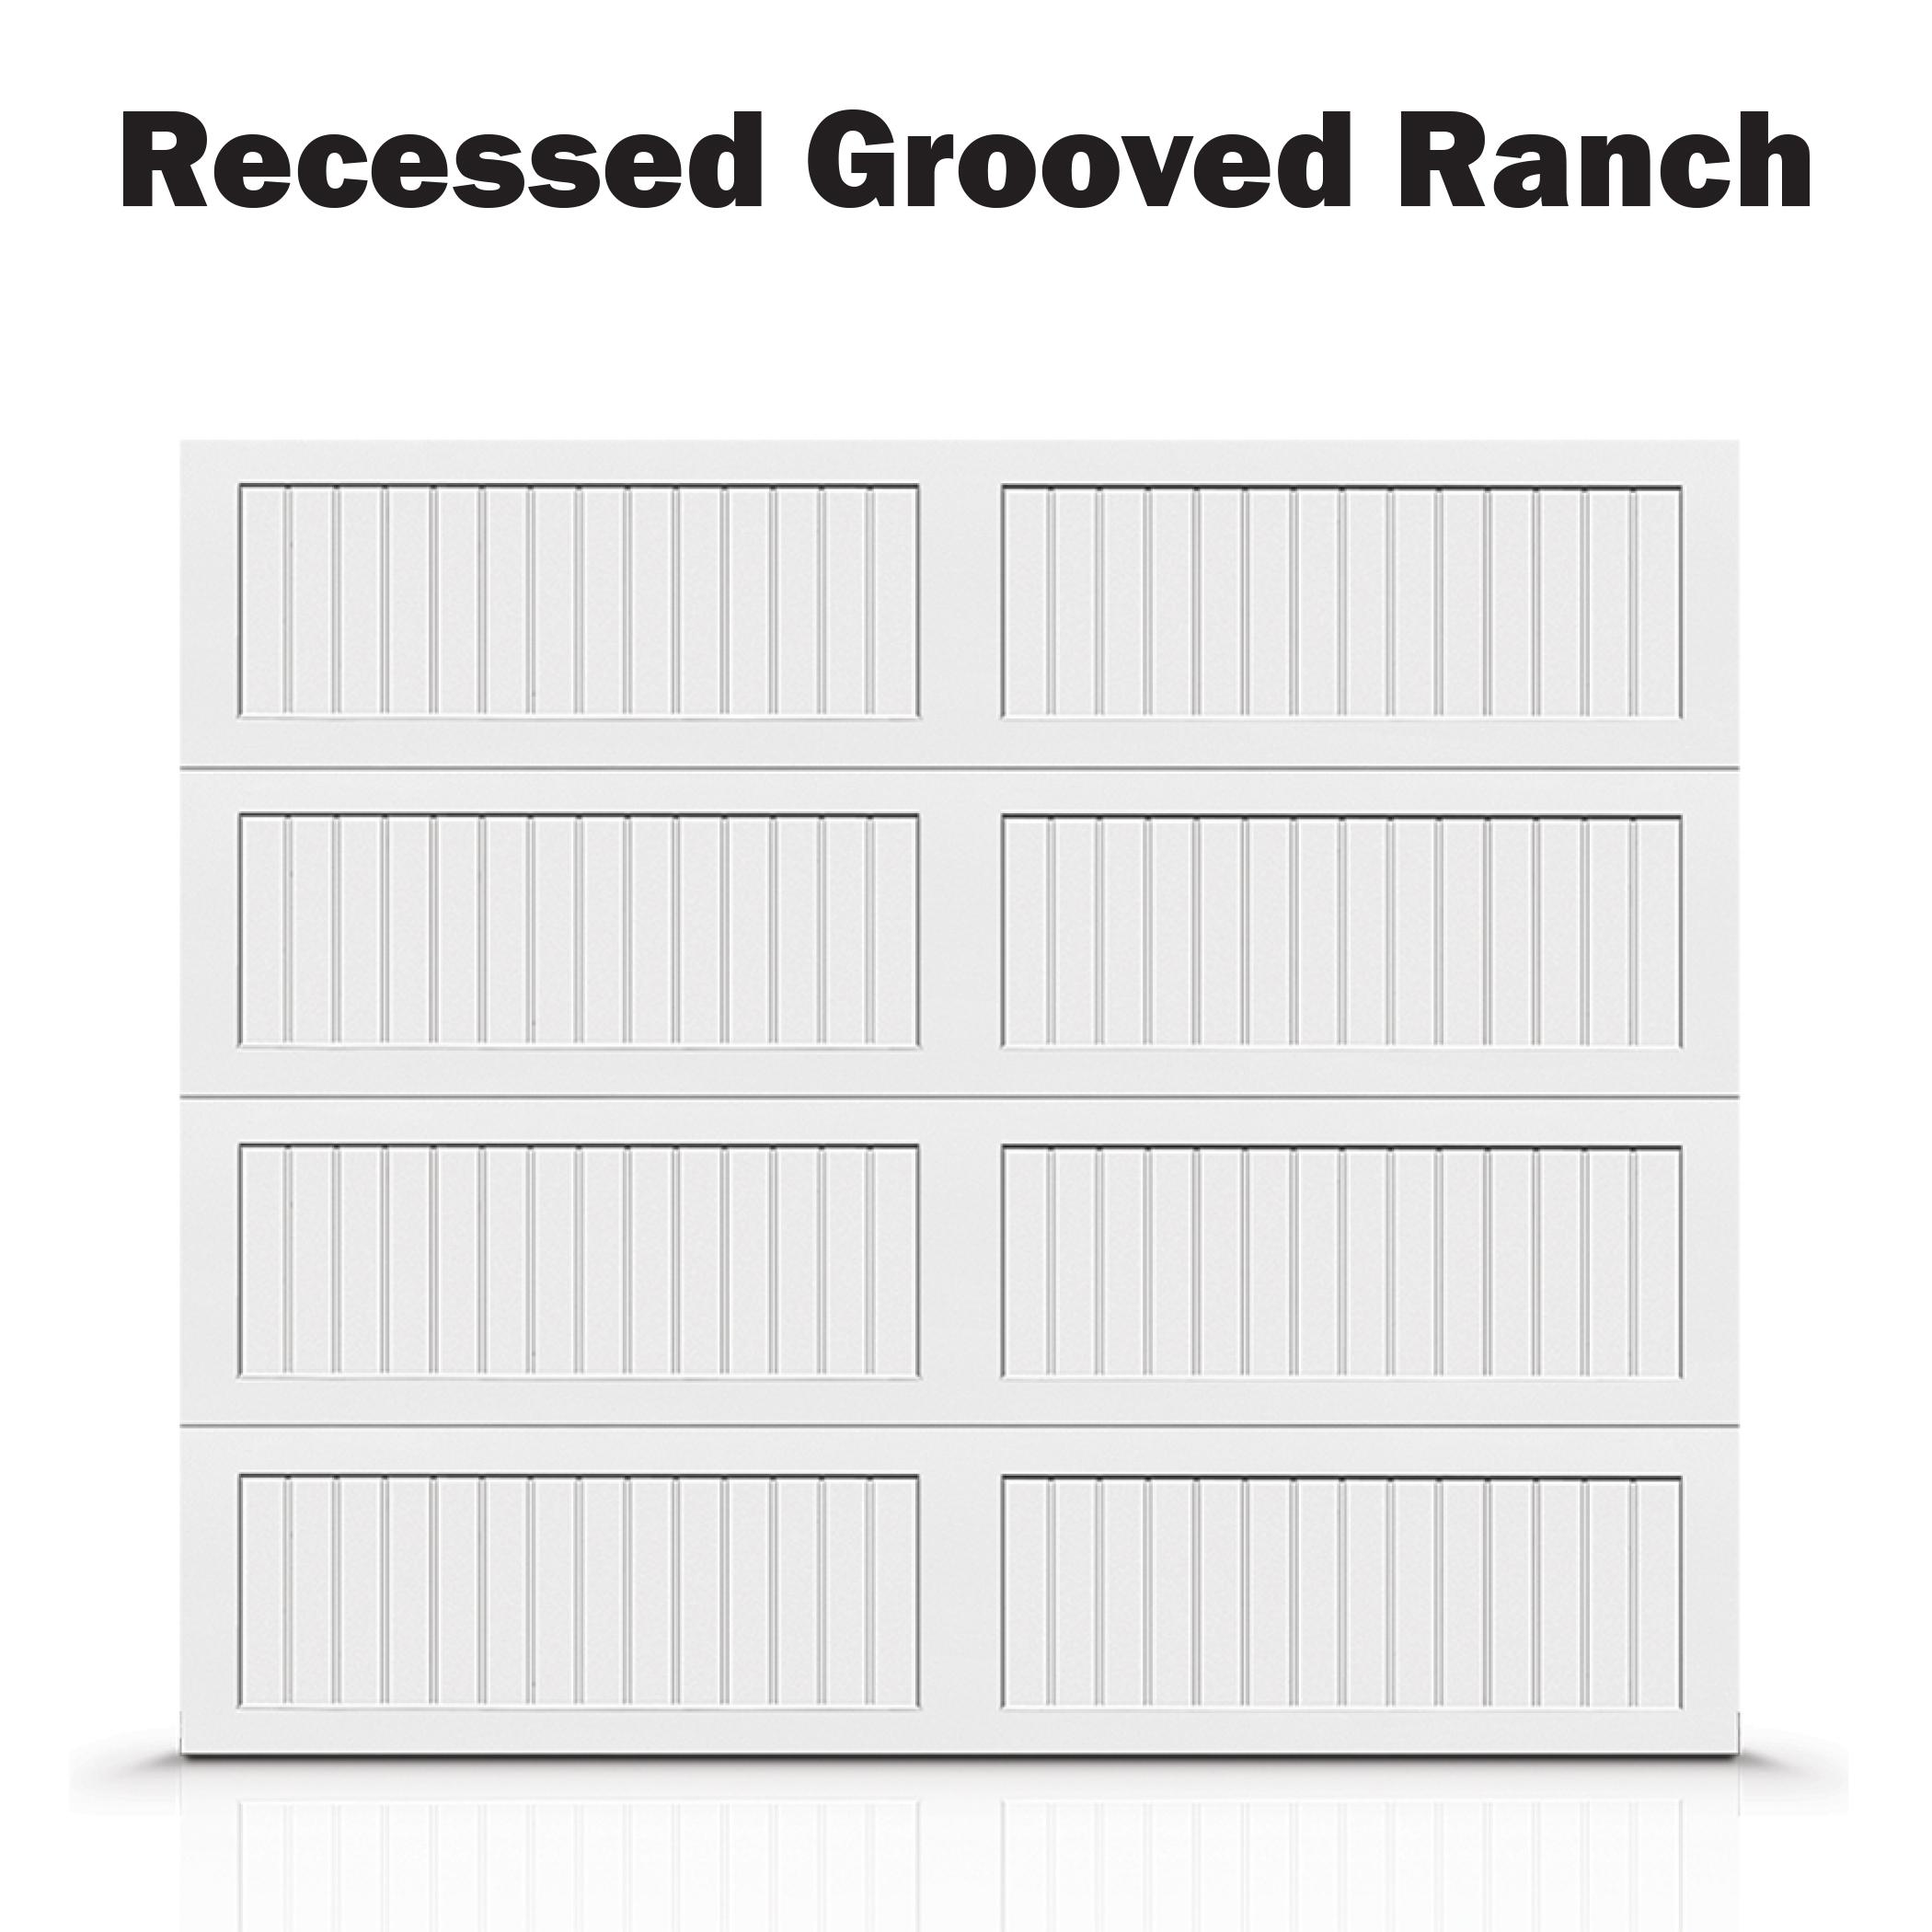 Recessed Grooved Ranch - Premium.jpg